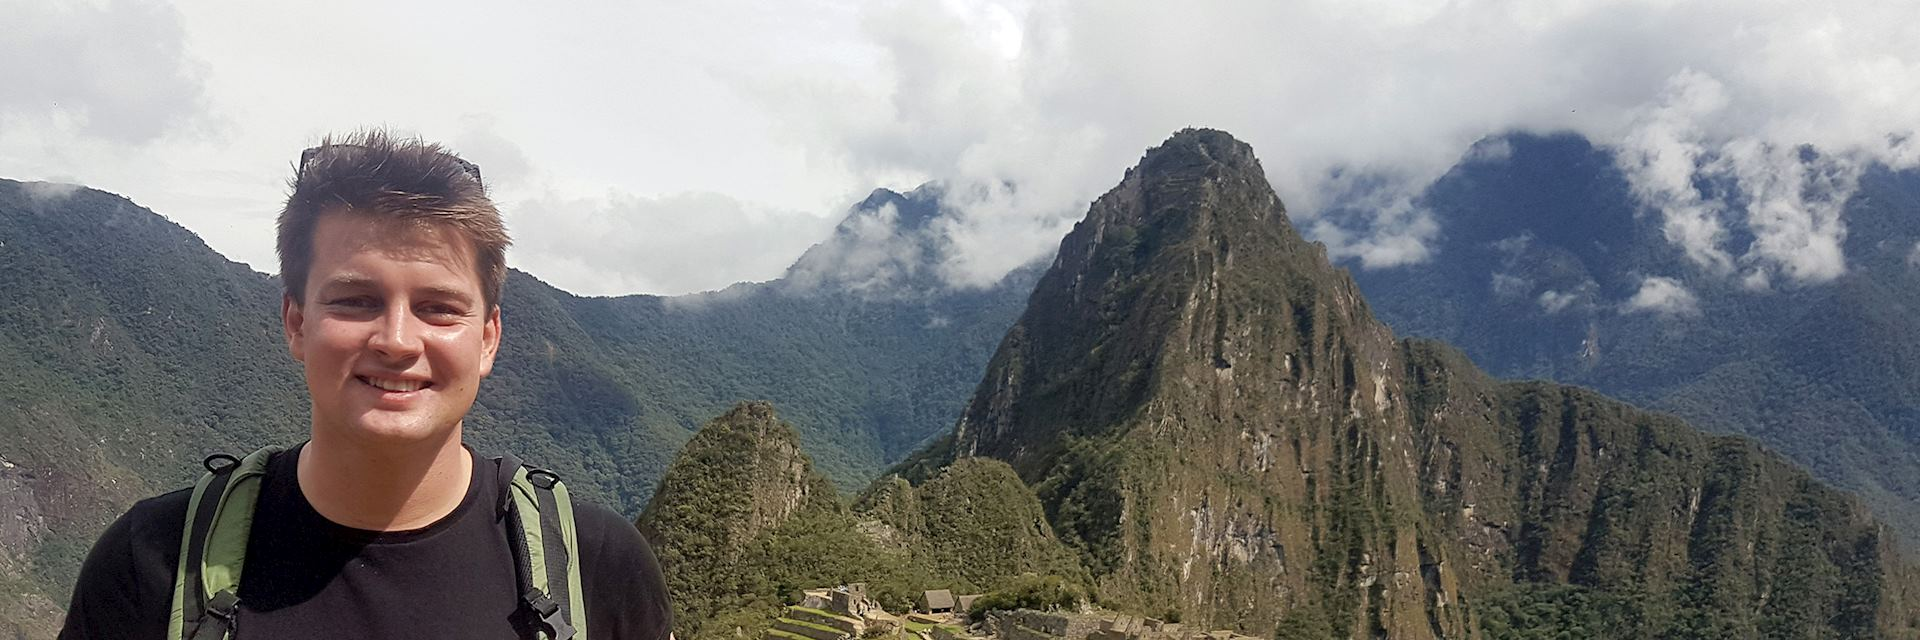 Jonny at Machu Picchu, Peru